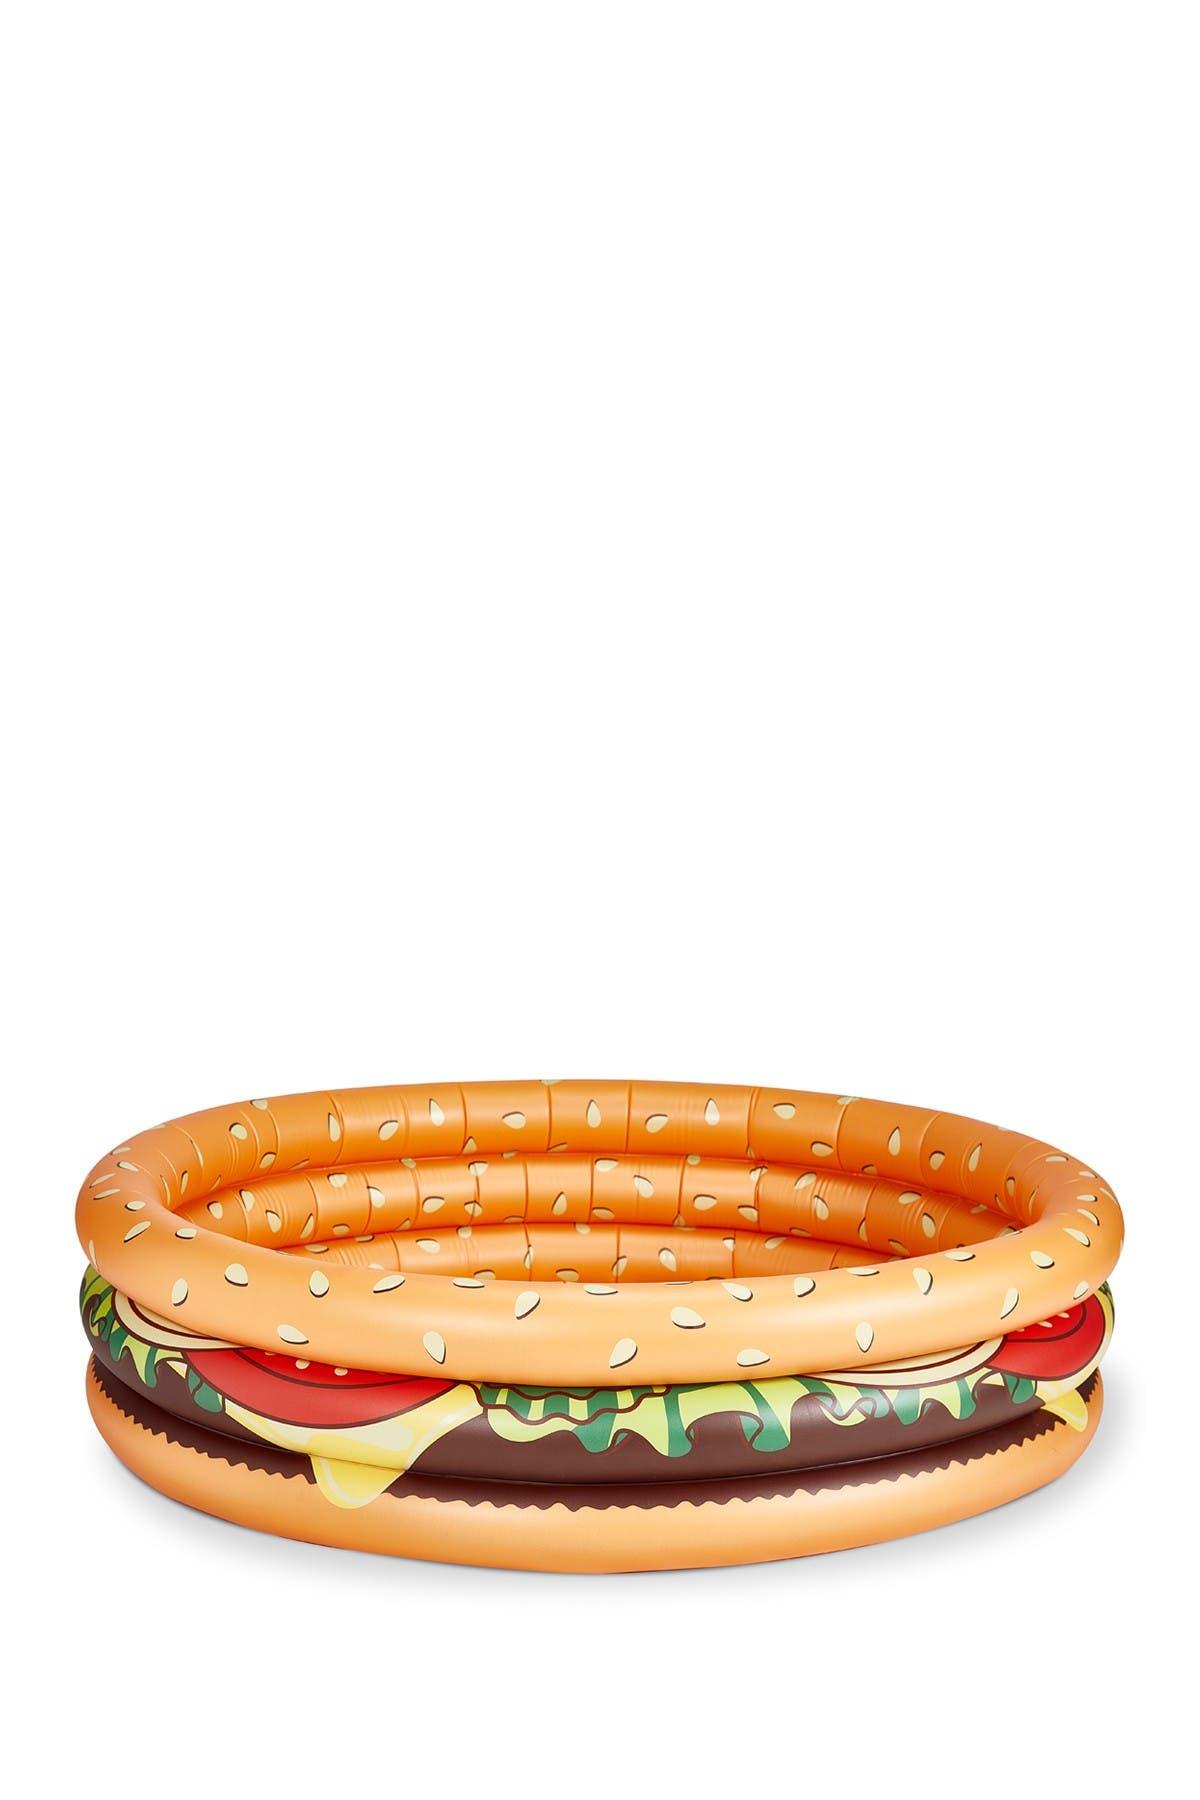 Image of BIG MOUTH TOYS Hamburger Donut Kiddie Pool